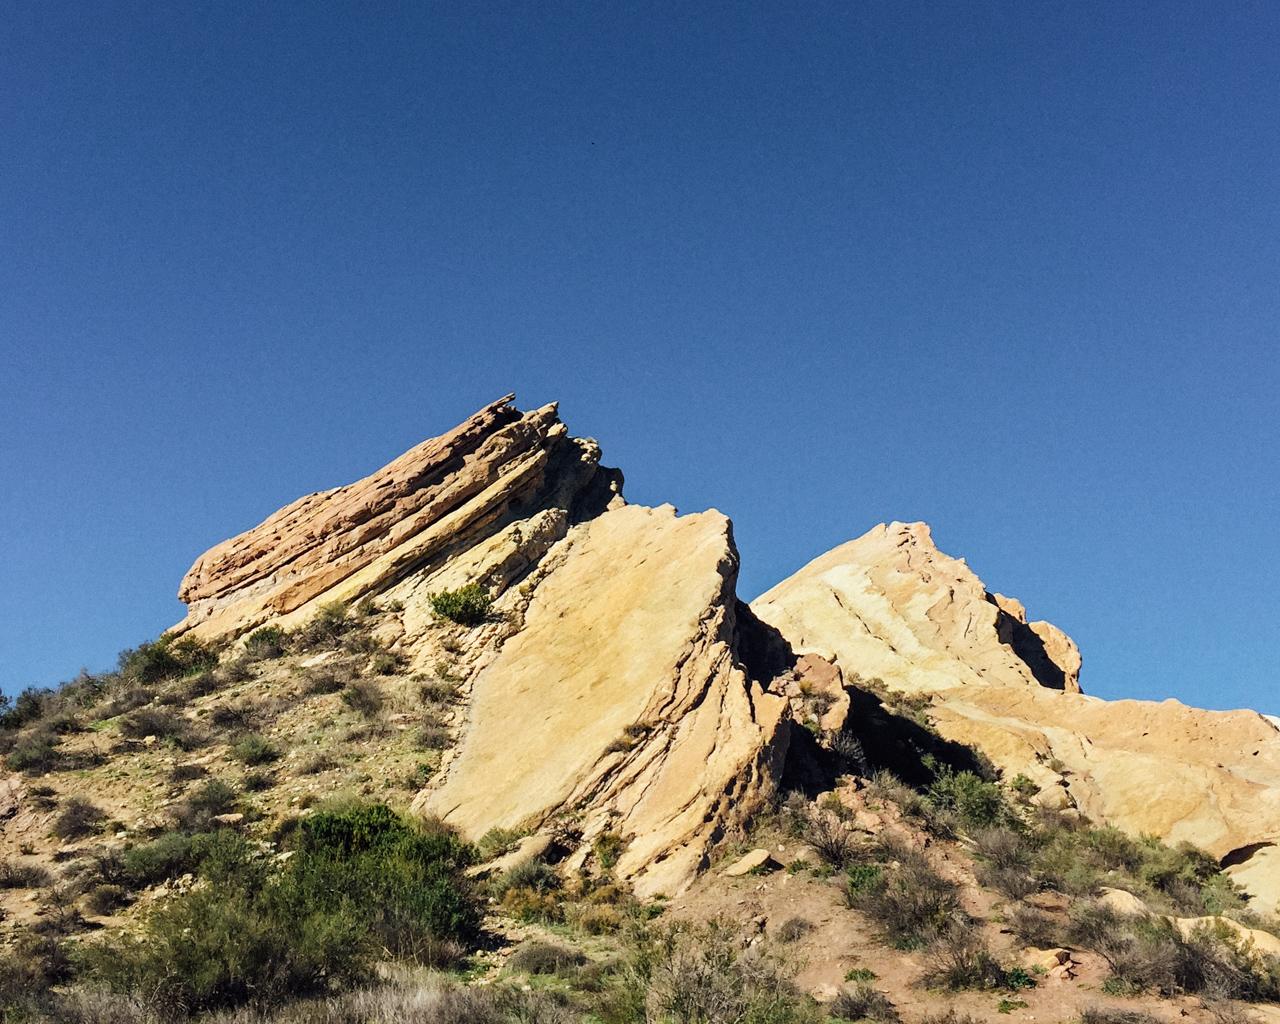 Different views of Vasquez Rocks